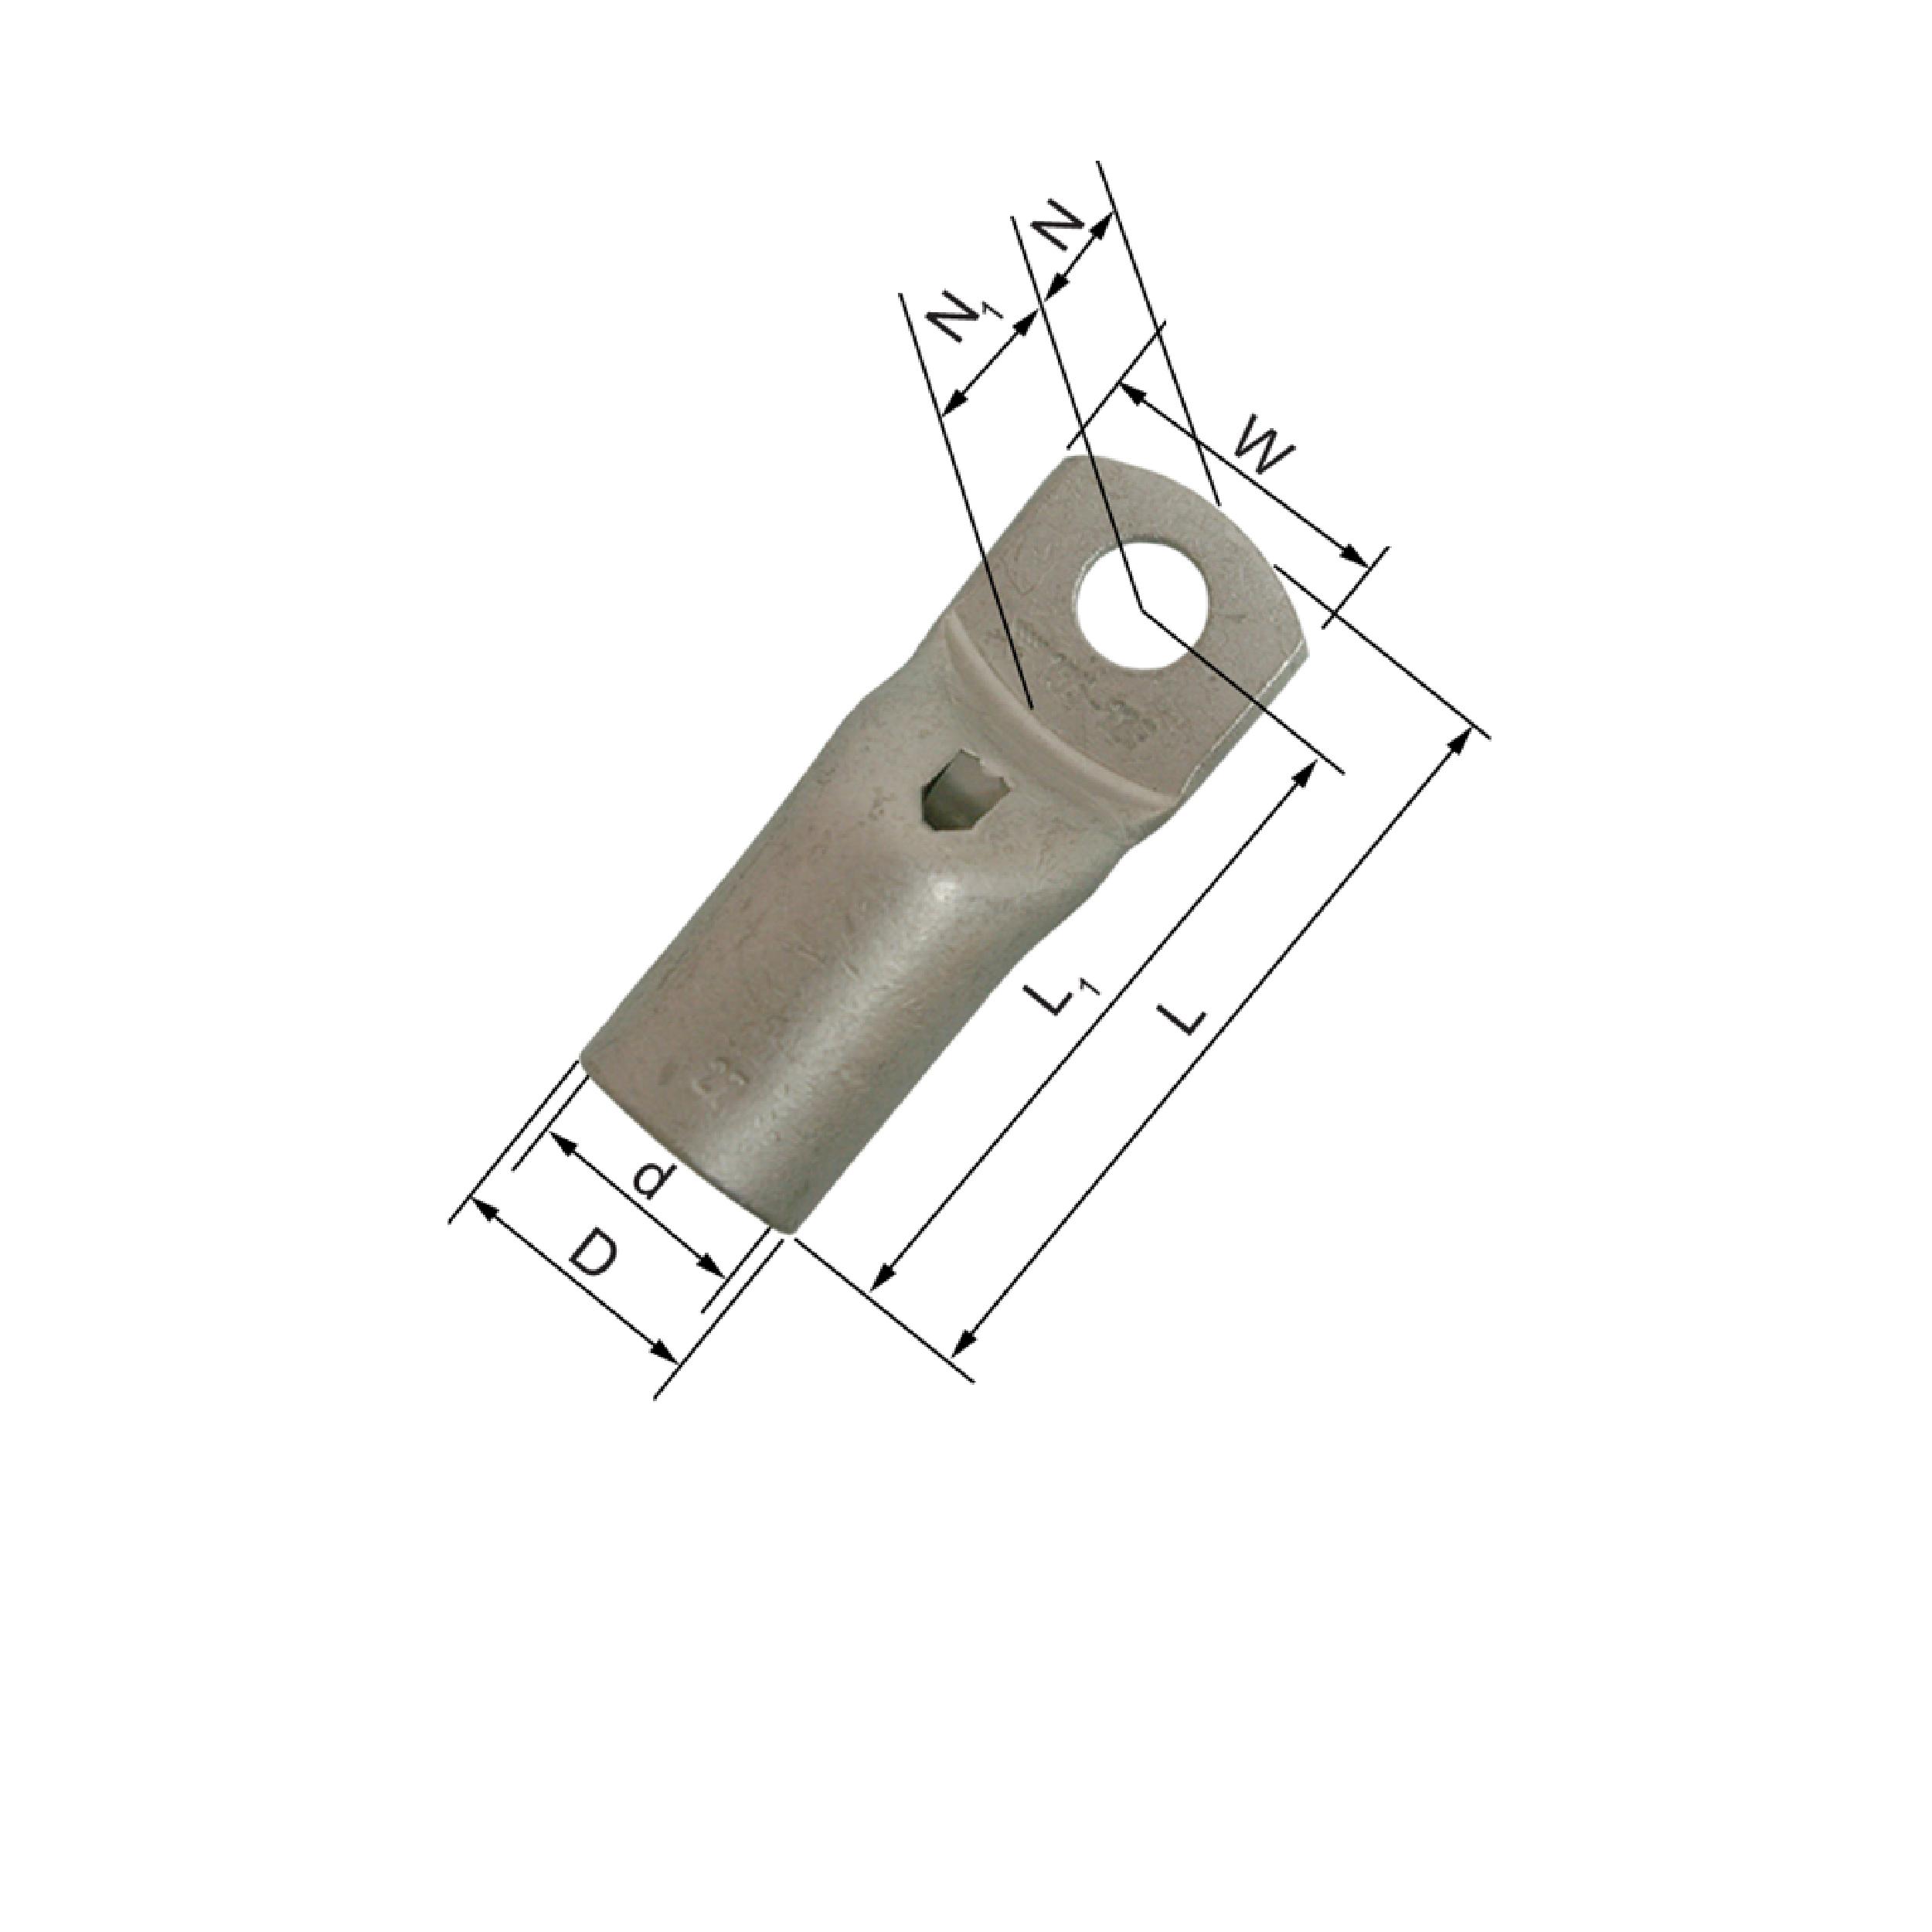 Elpress KRFN Narrow Palm Copper Cable Lugs (50-240mm²) - KRFN120-10, KRFN120-12, KRFN185-10